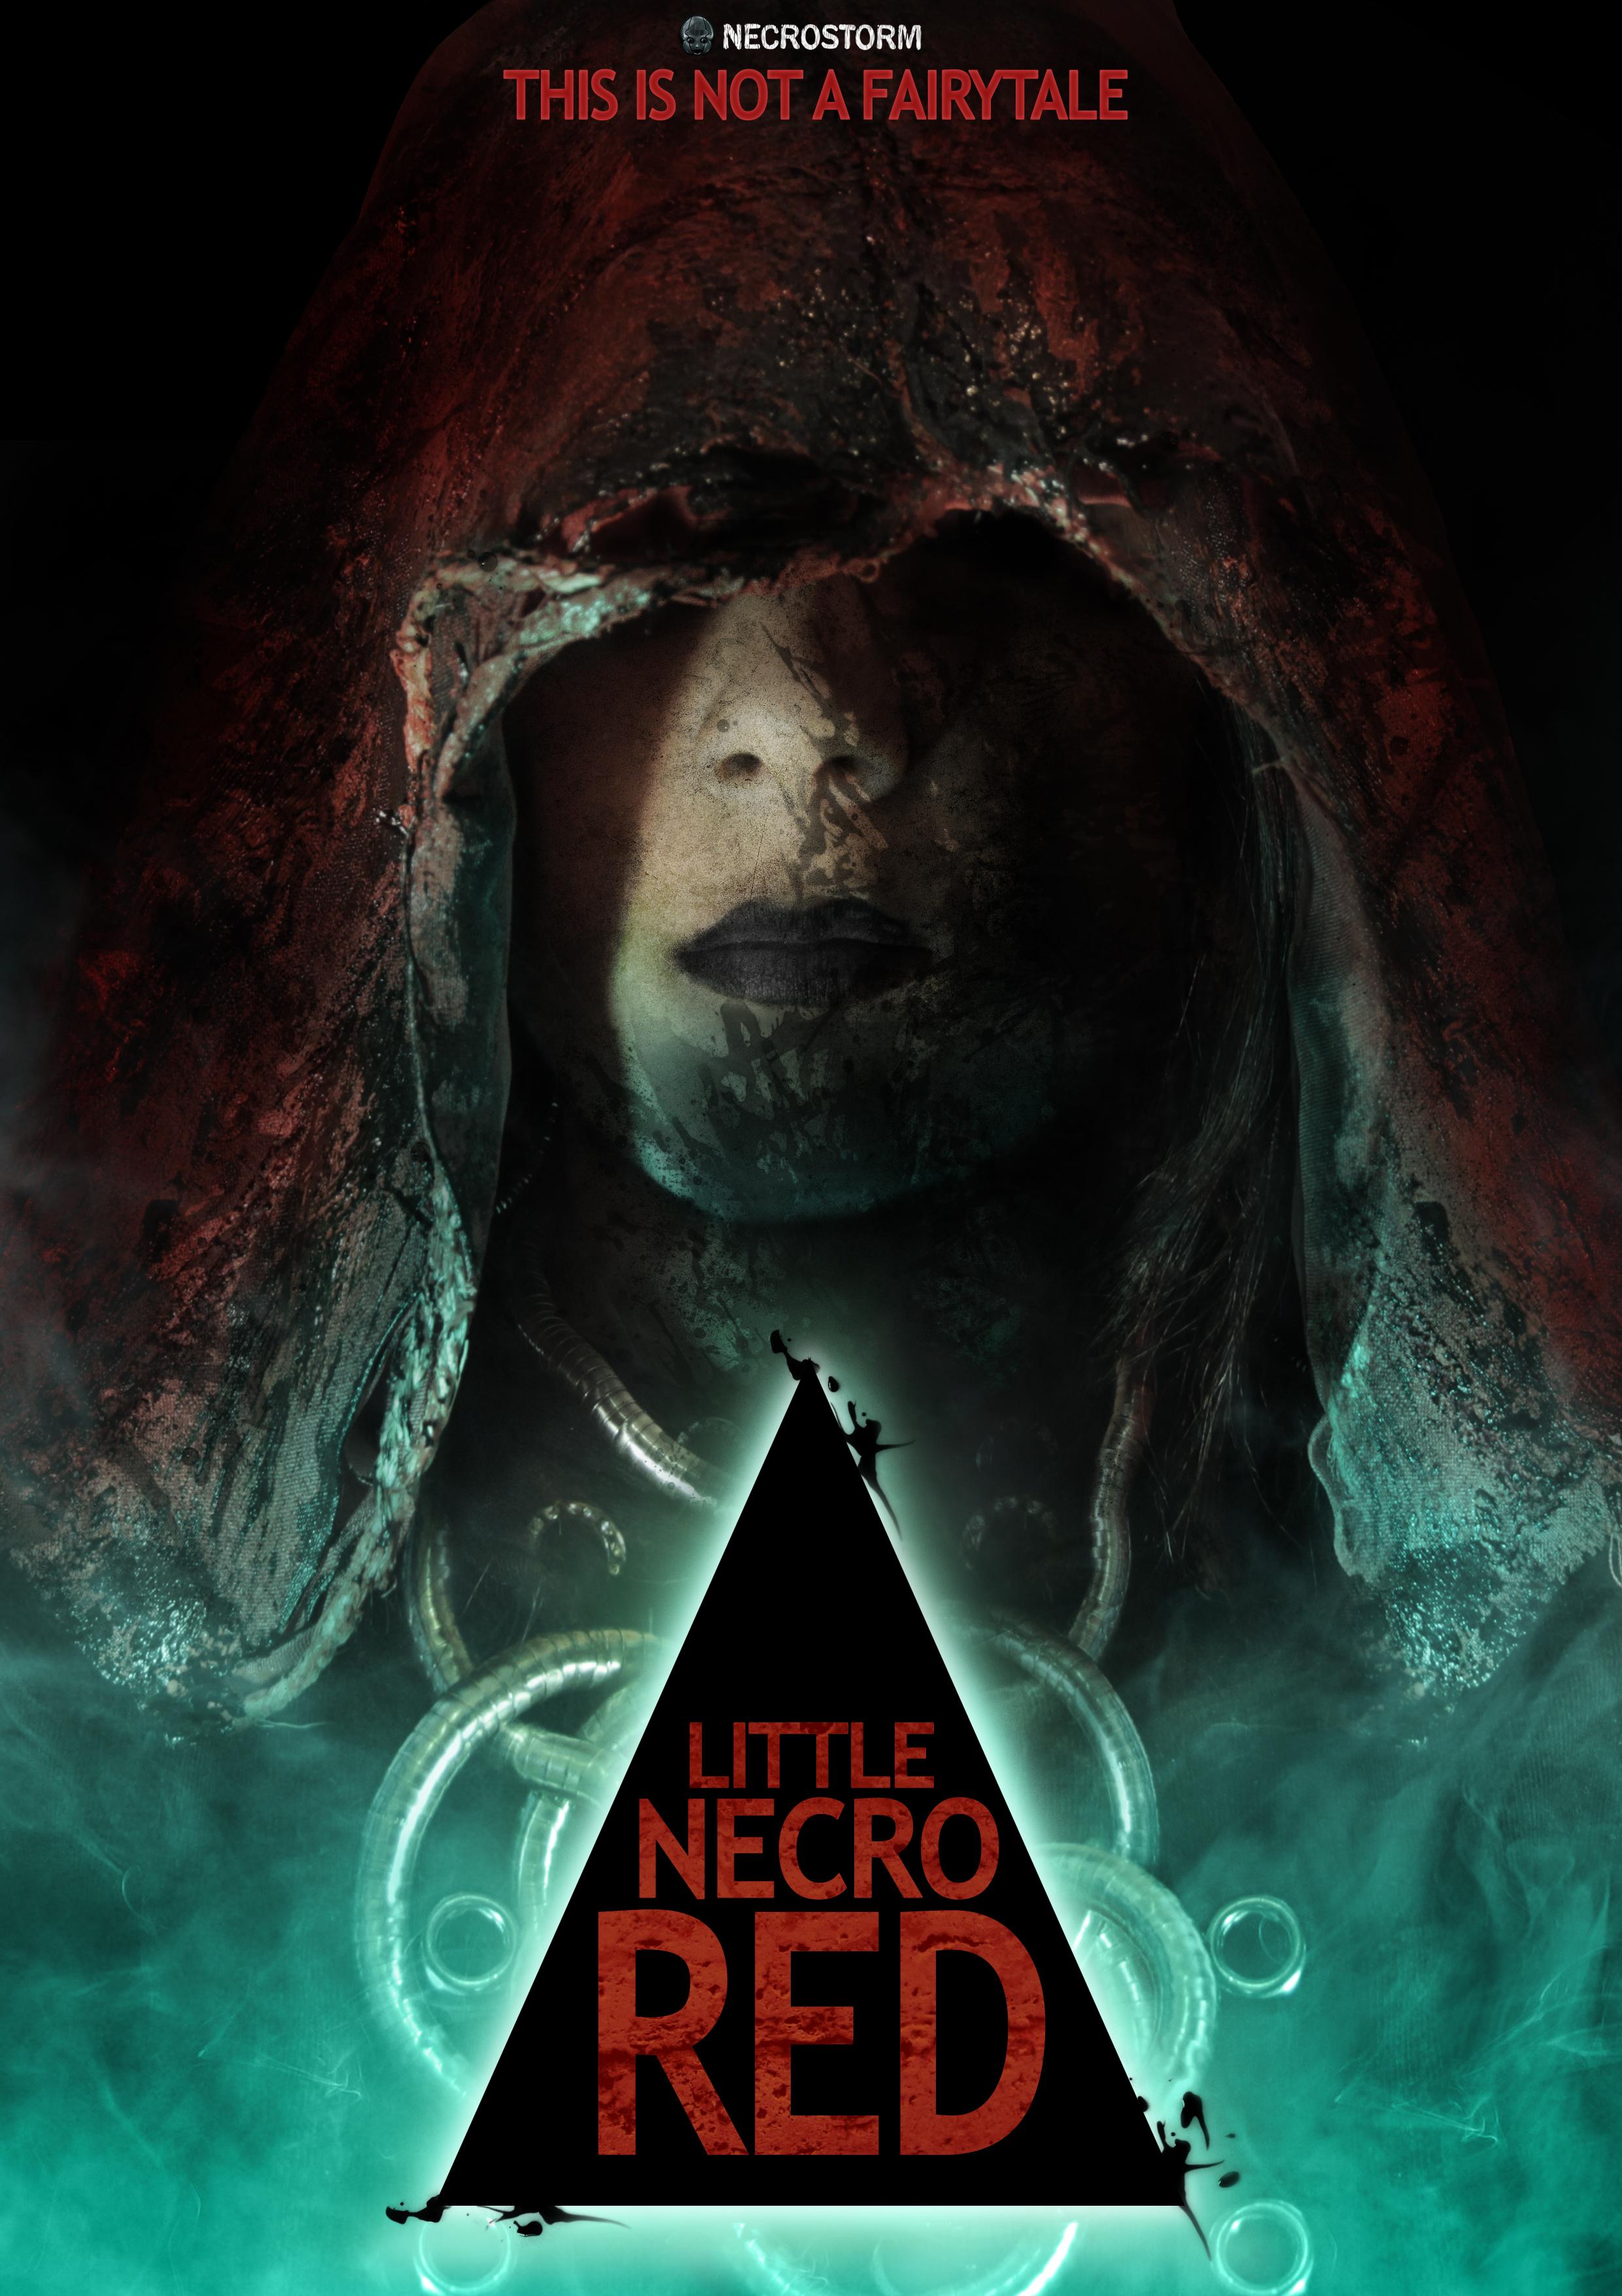 Little Necro Red